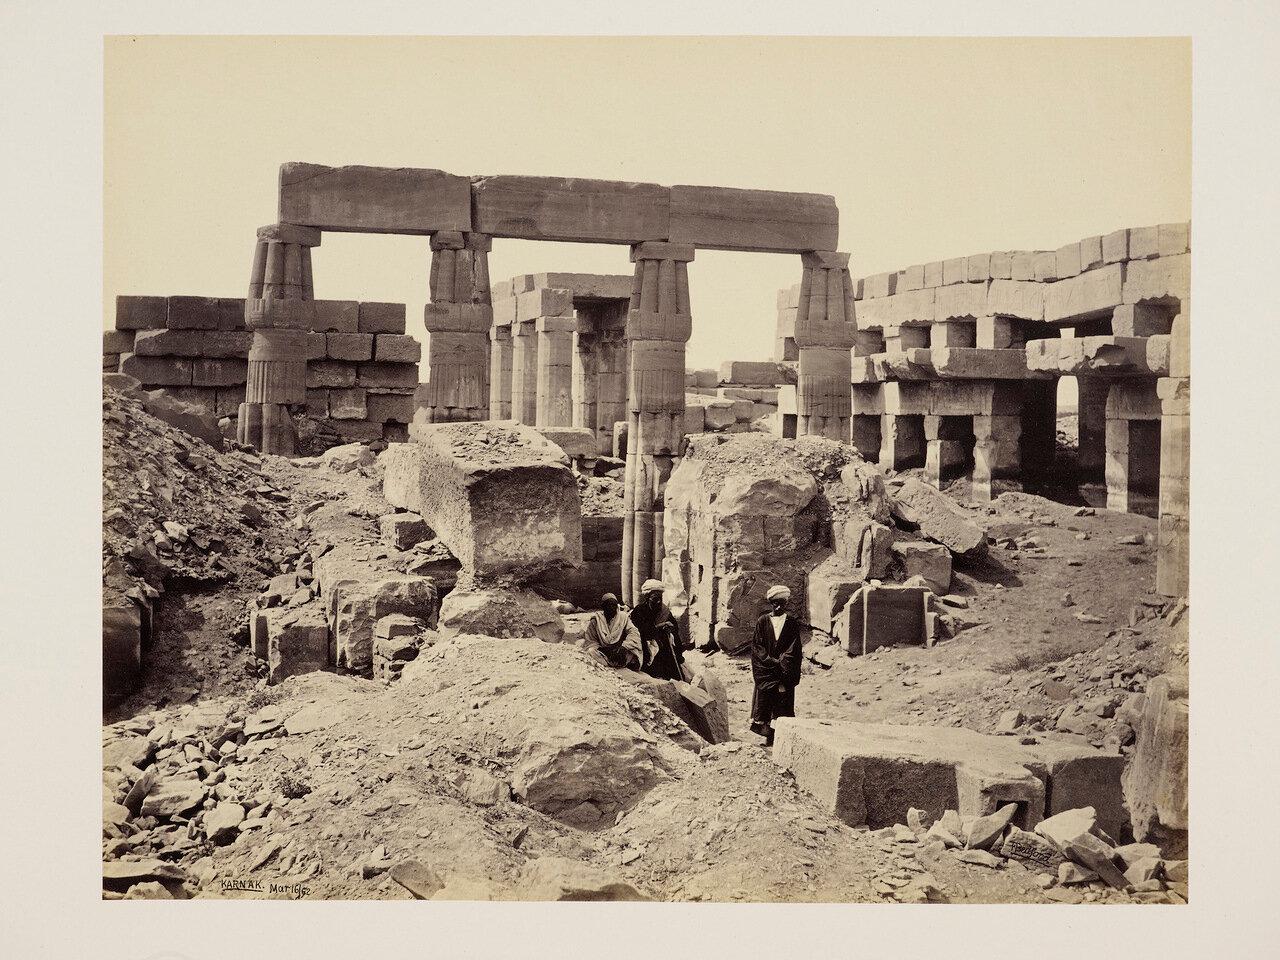 16 марта 1862. Карнак. Храм Амона